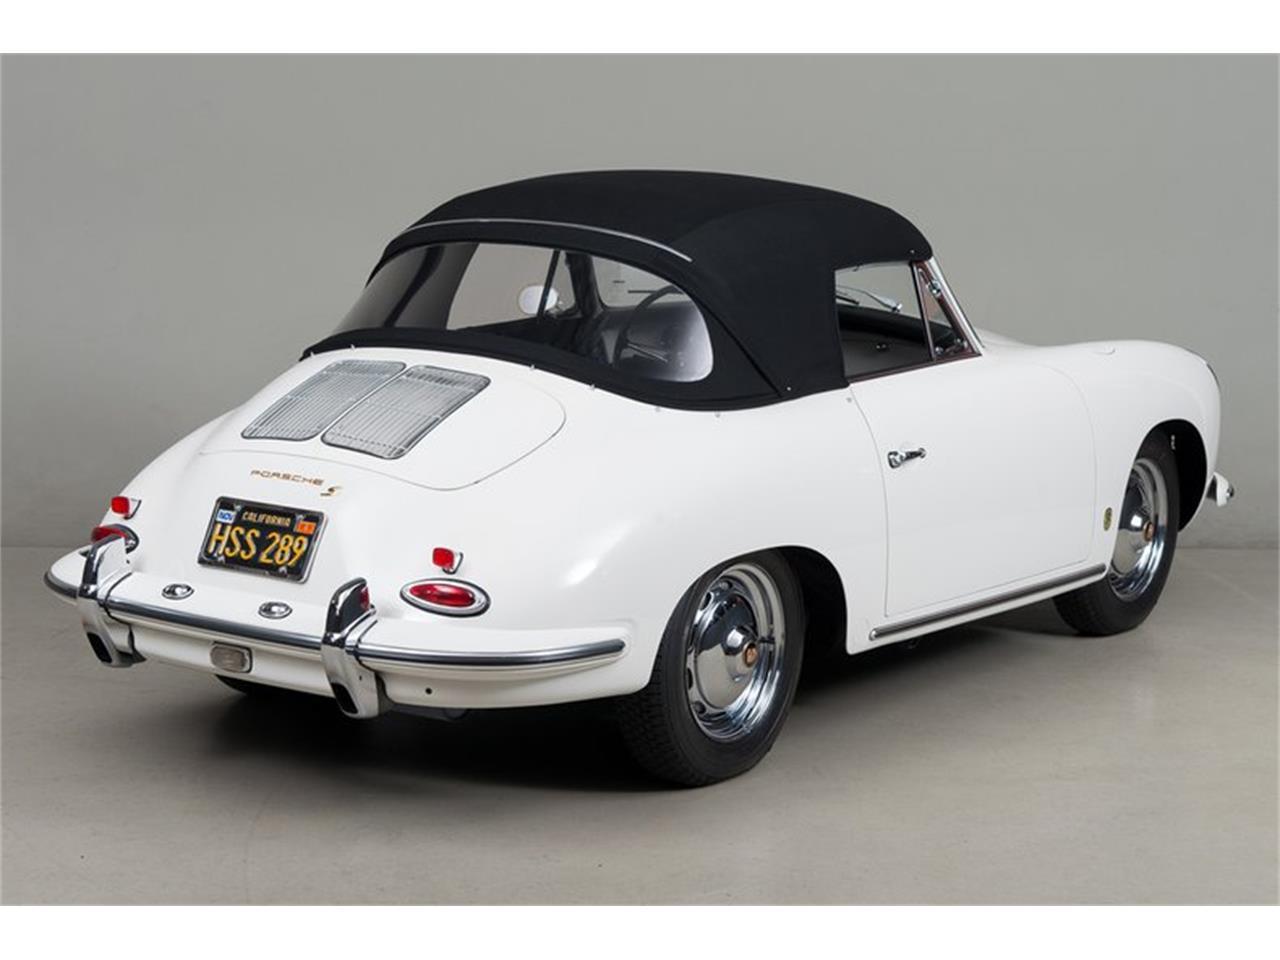 1963 Porsche 356 (CC-1251044) for sale in Scotts Valley, California